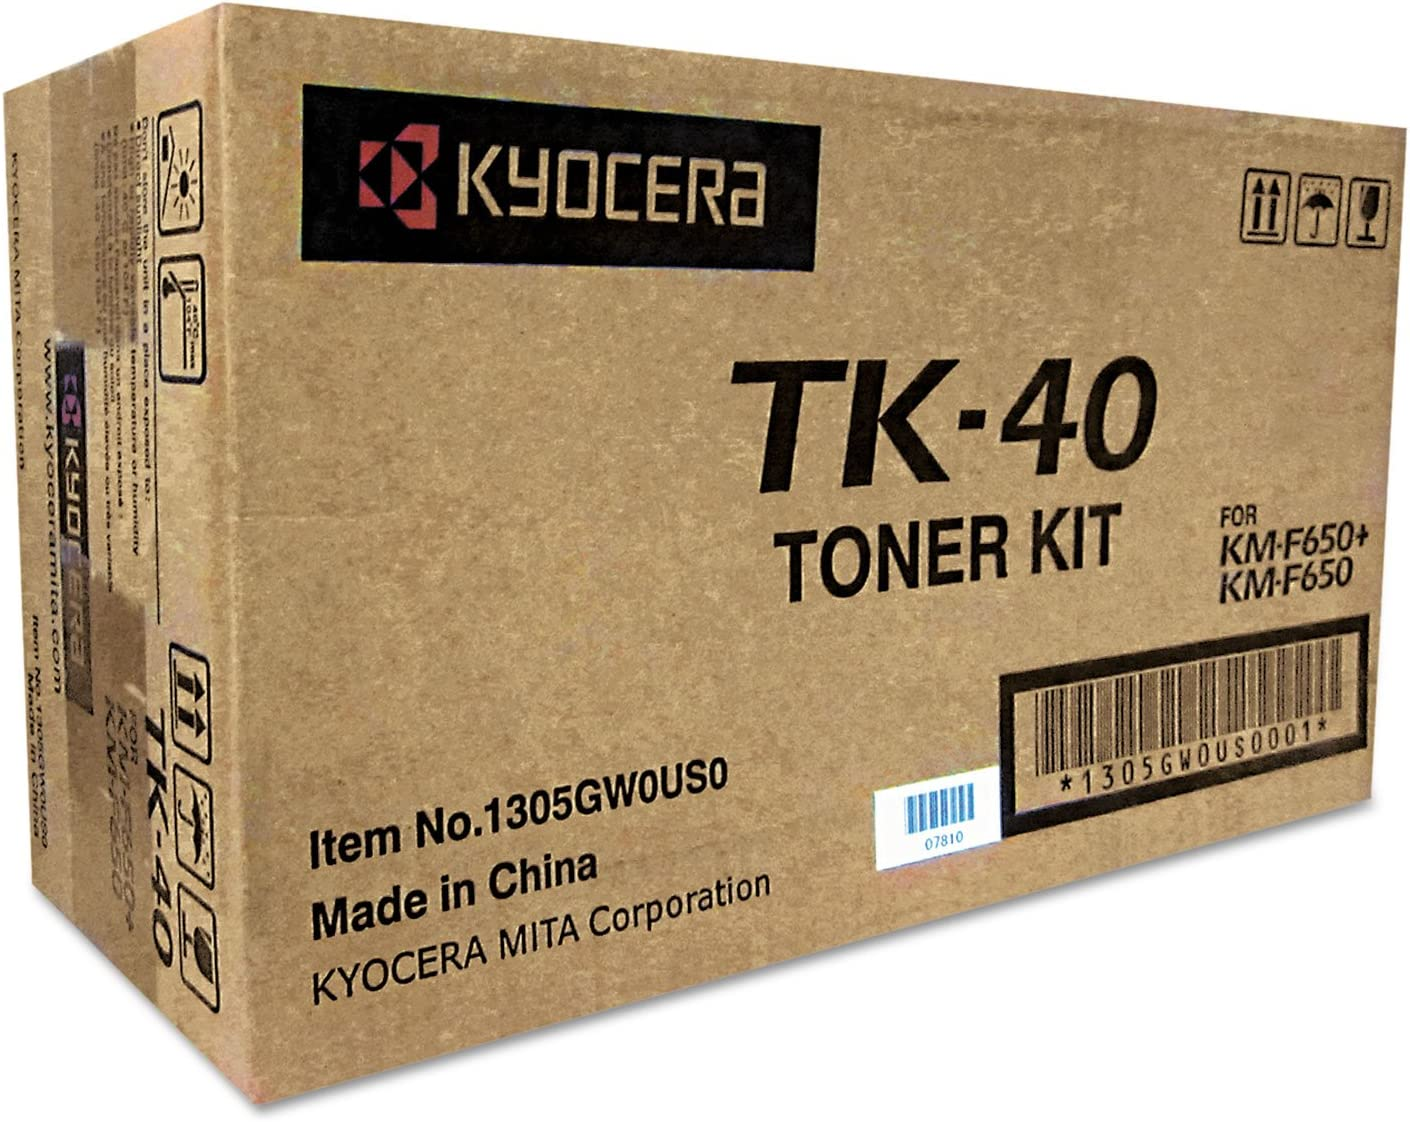 Black Toner Cartridge For KM-F650 AIO Fax Machine